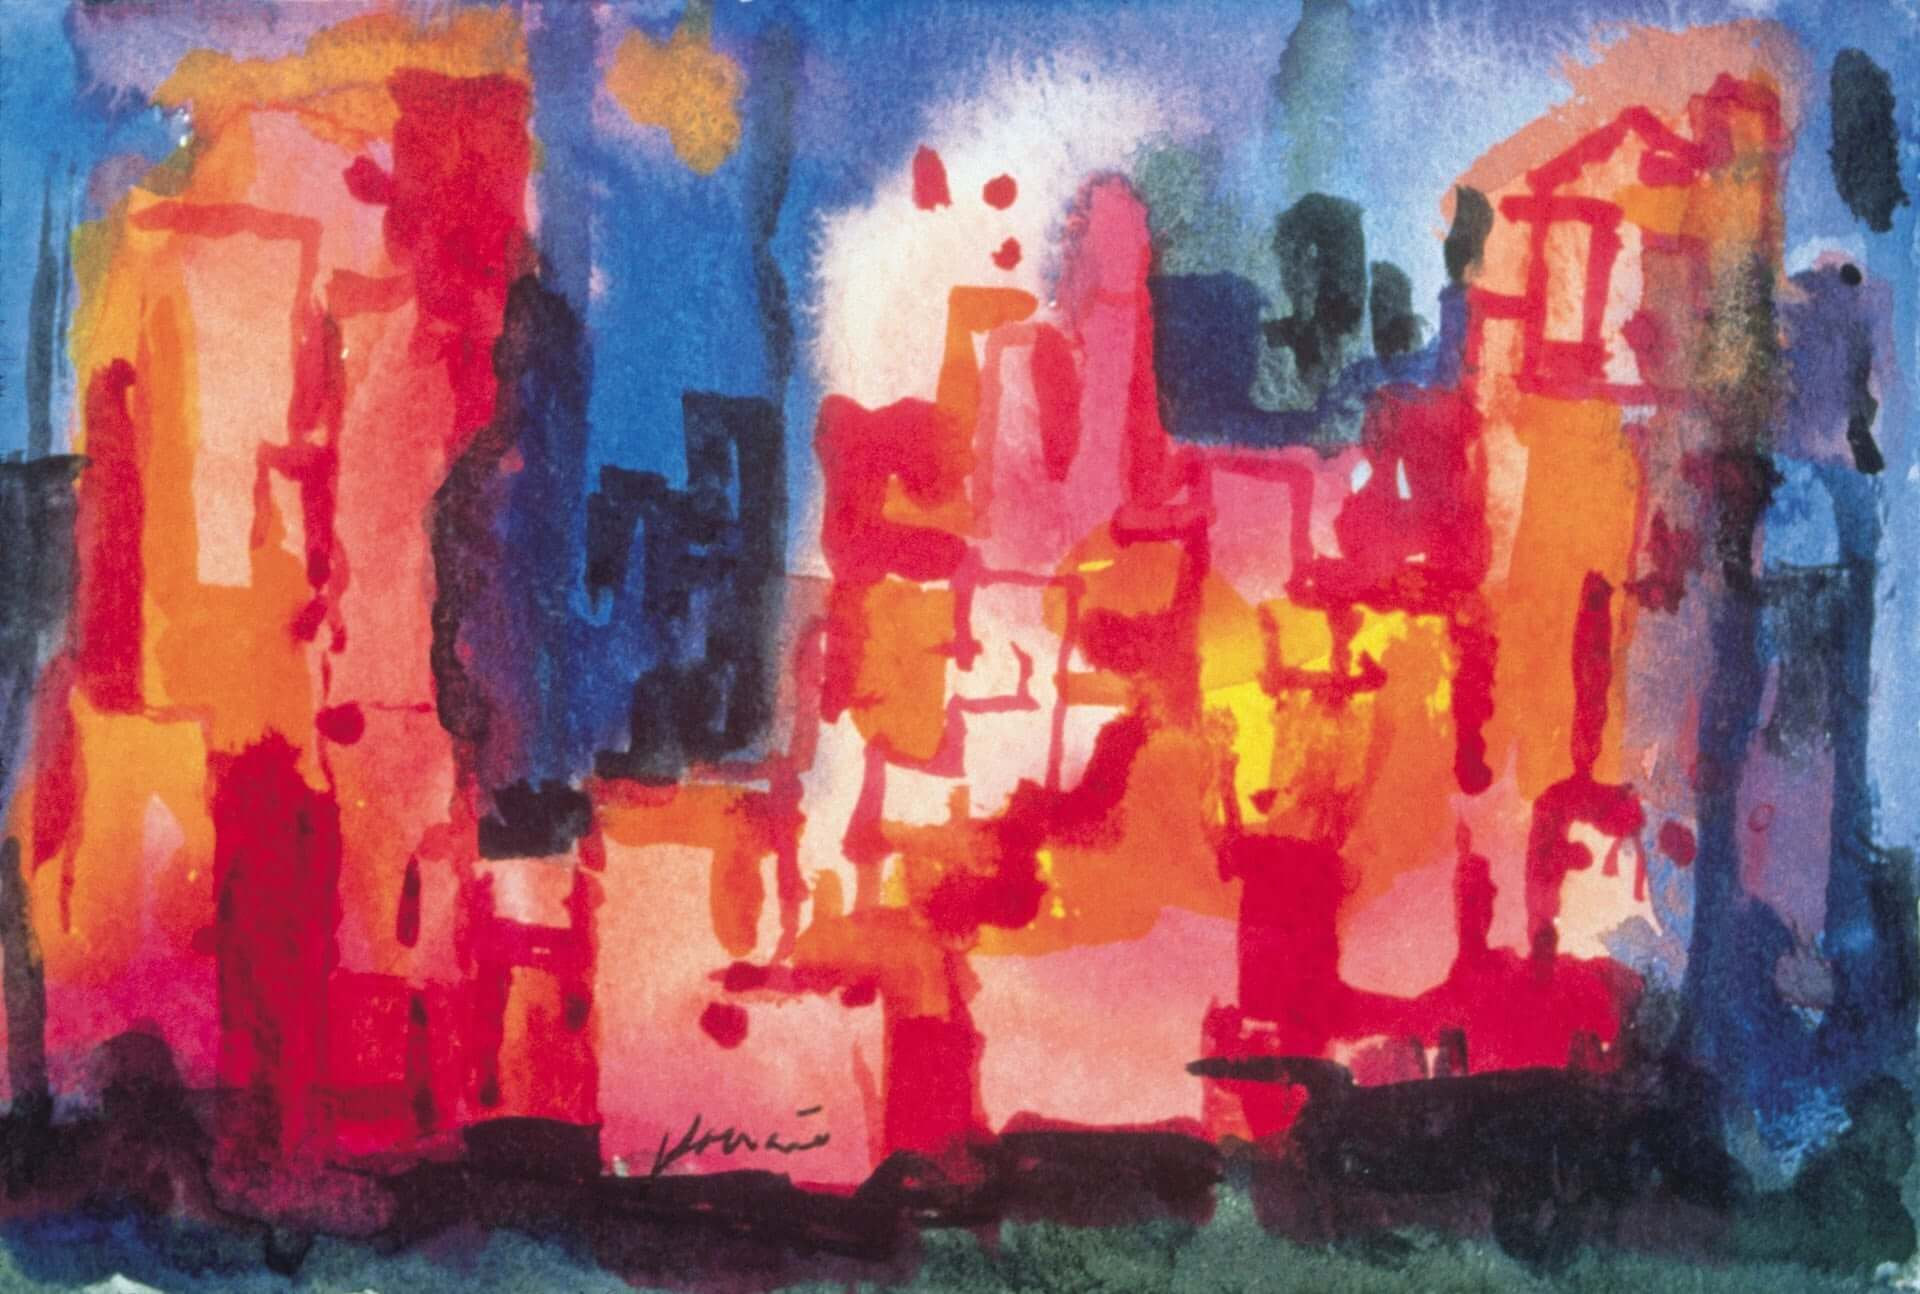 KEENが世界的アーティスト、ジェリー・ガルシアとのコラボアイテムを発売決定!アートワーク2作品をモチーフにしたシューズが登場 lf200730_keen-jerrygarcia_15-1920x1294